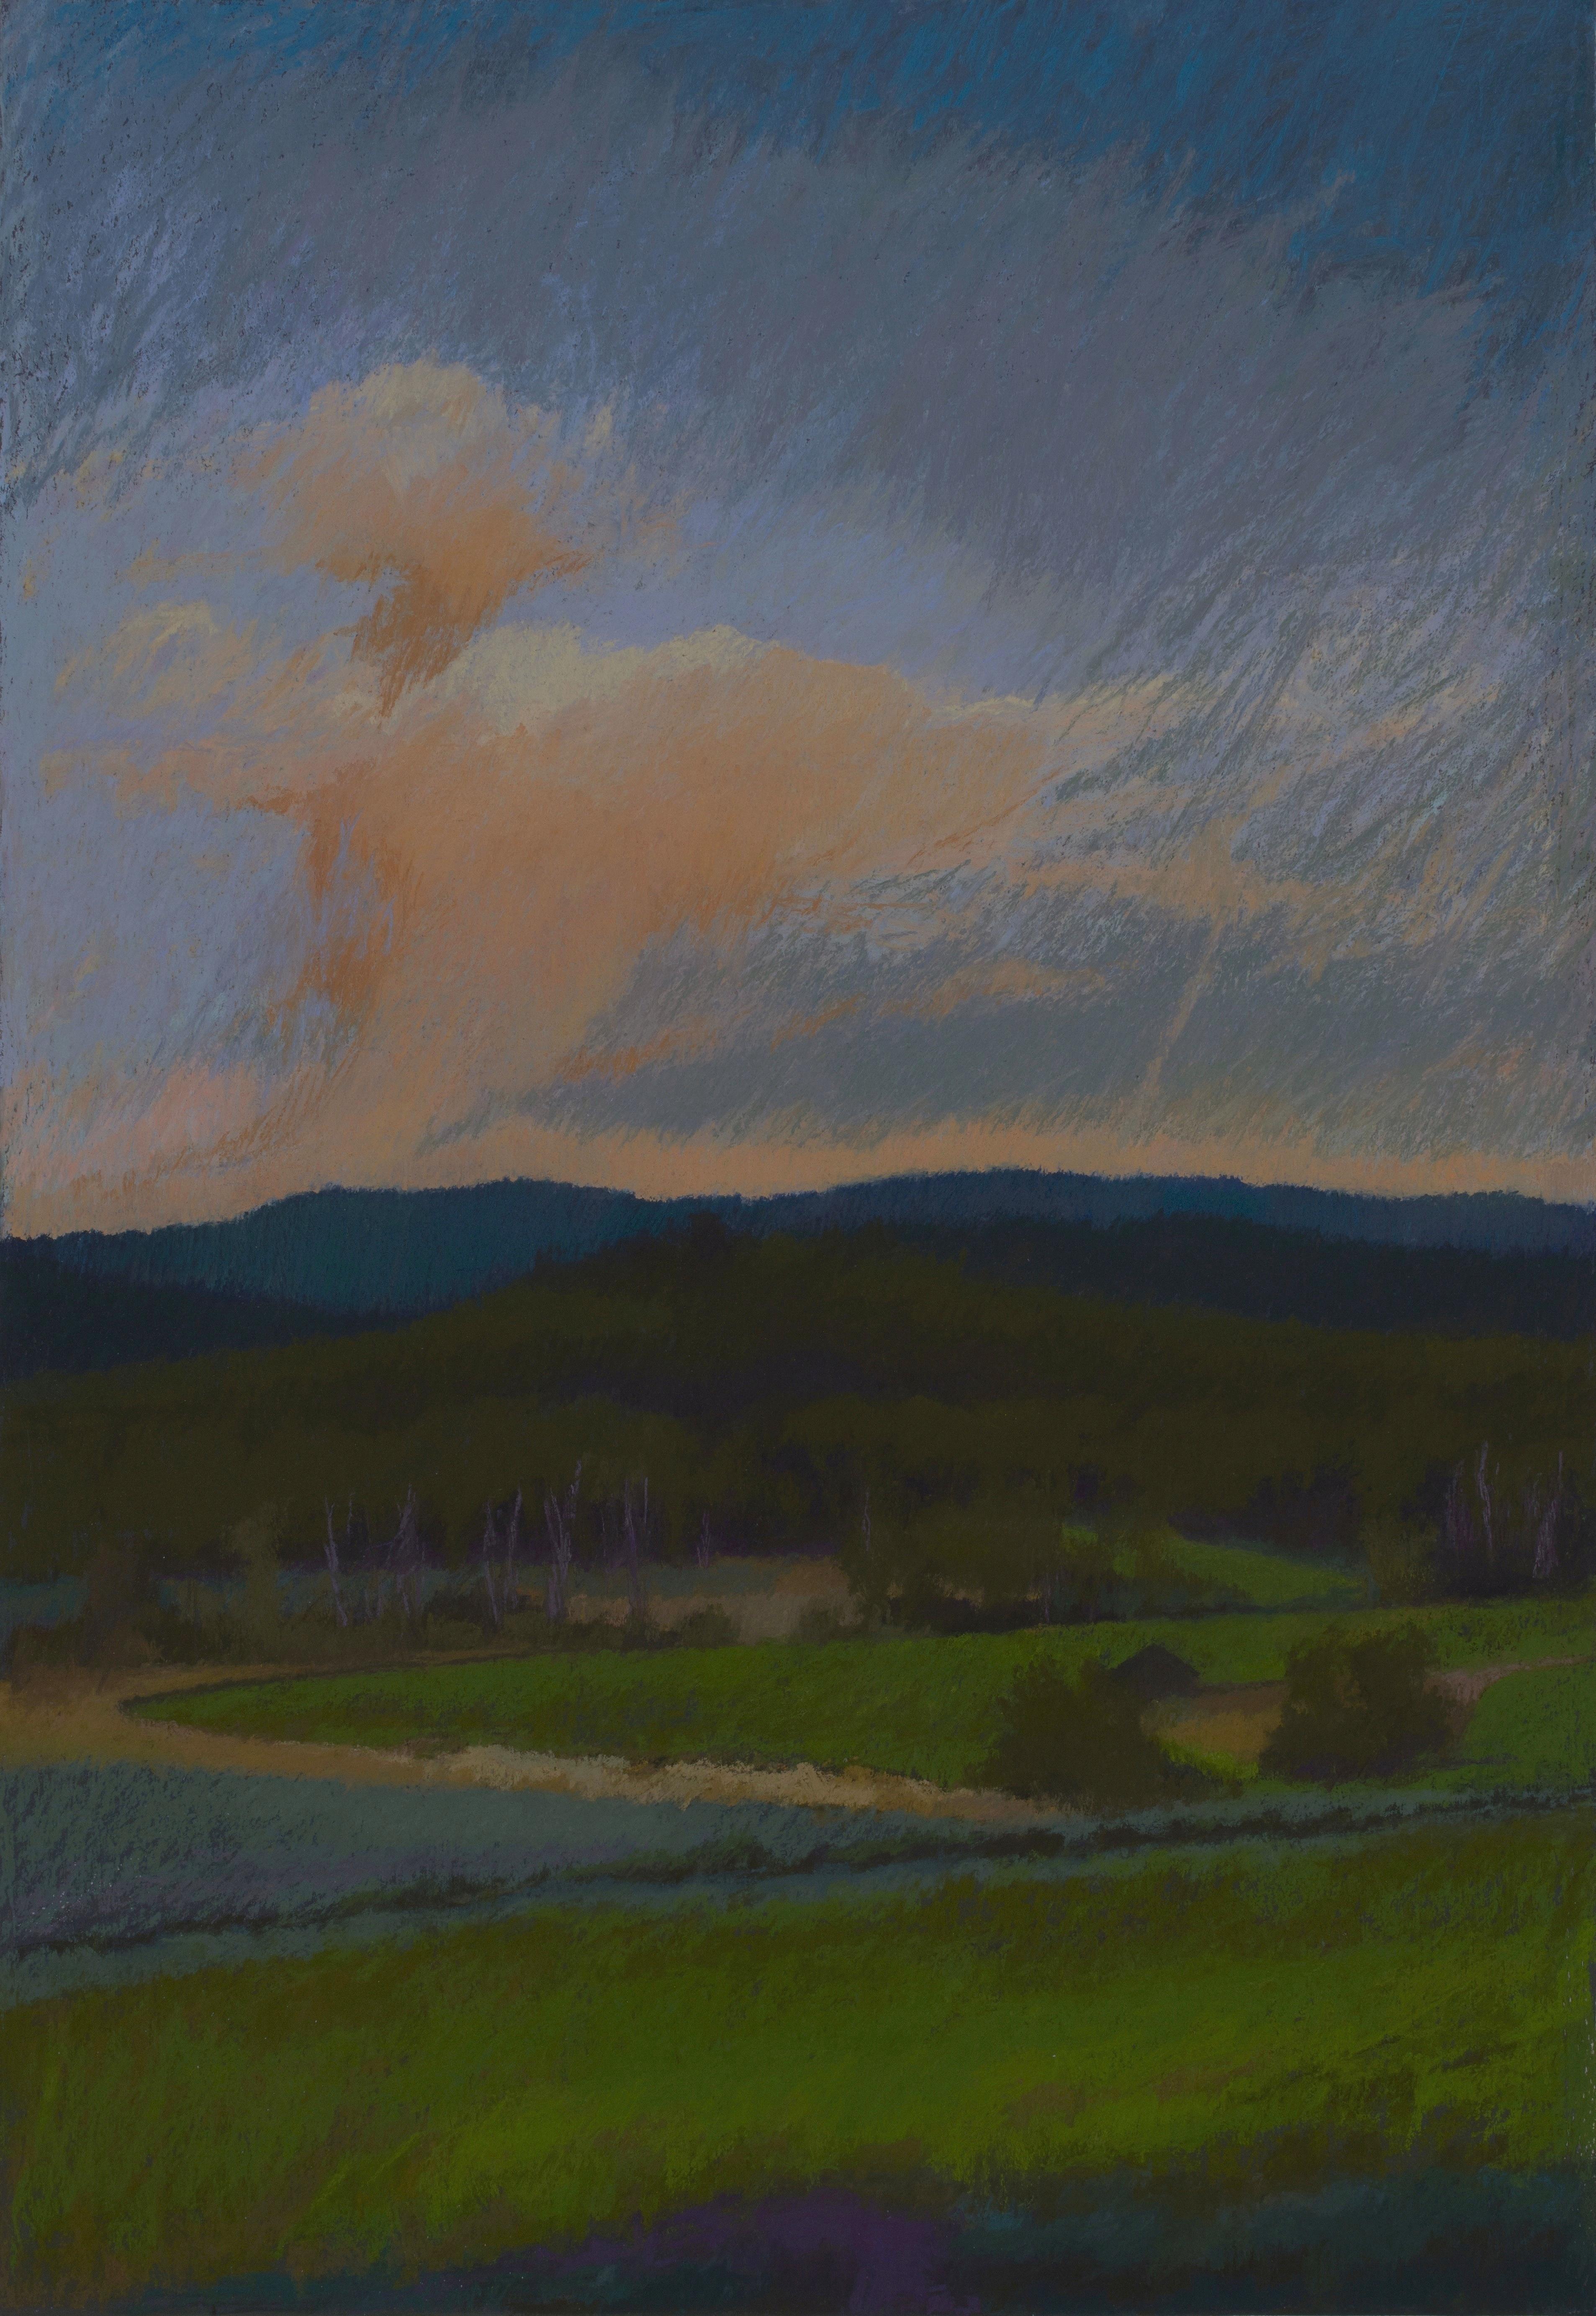 Buckwheat No. 14- Imposing on Lush Green